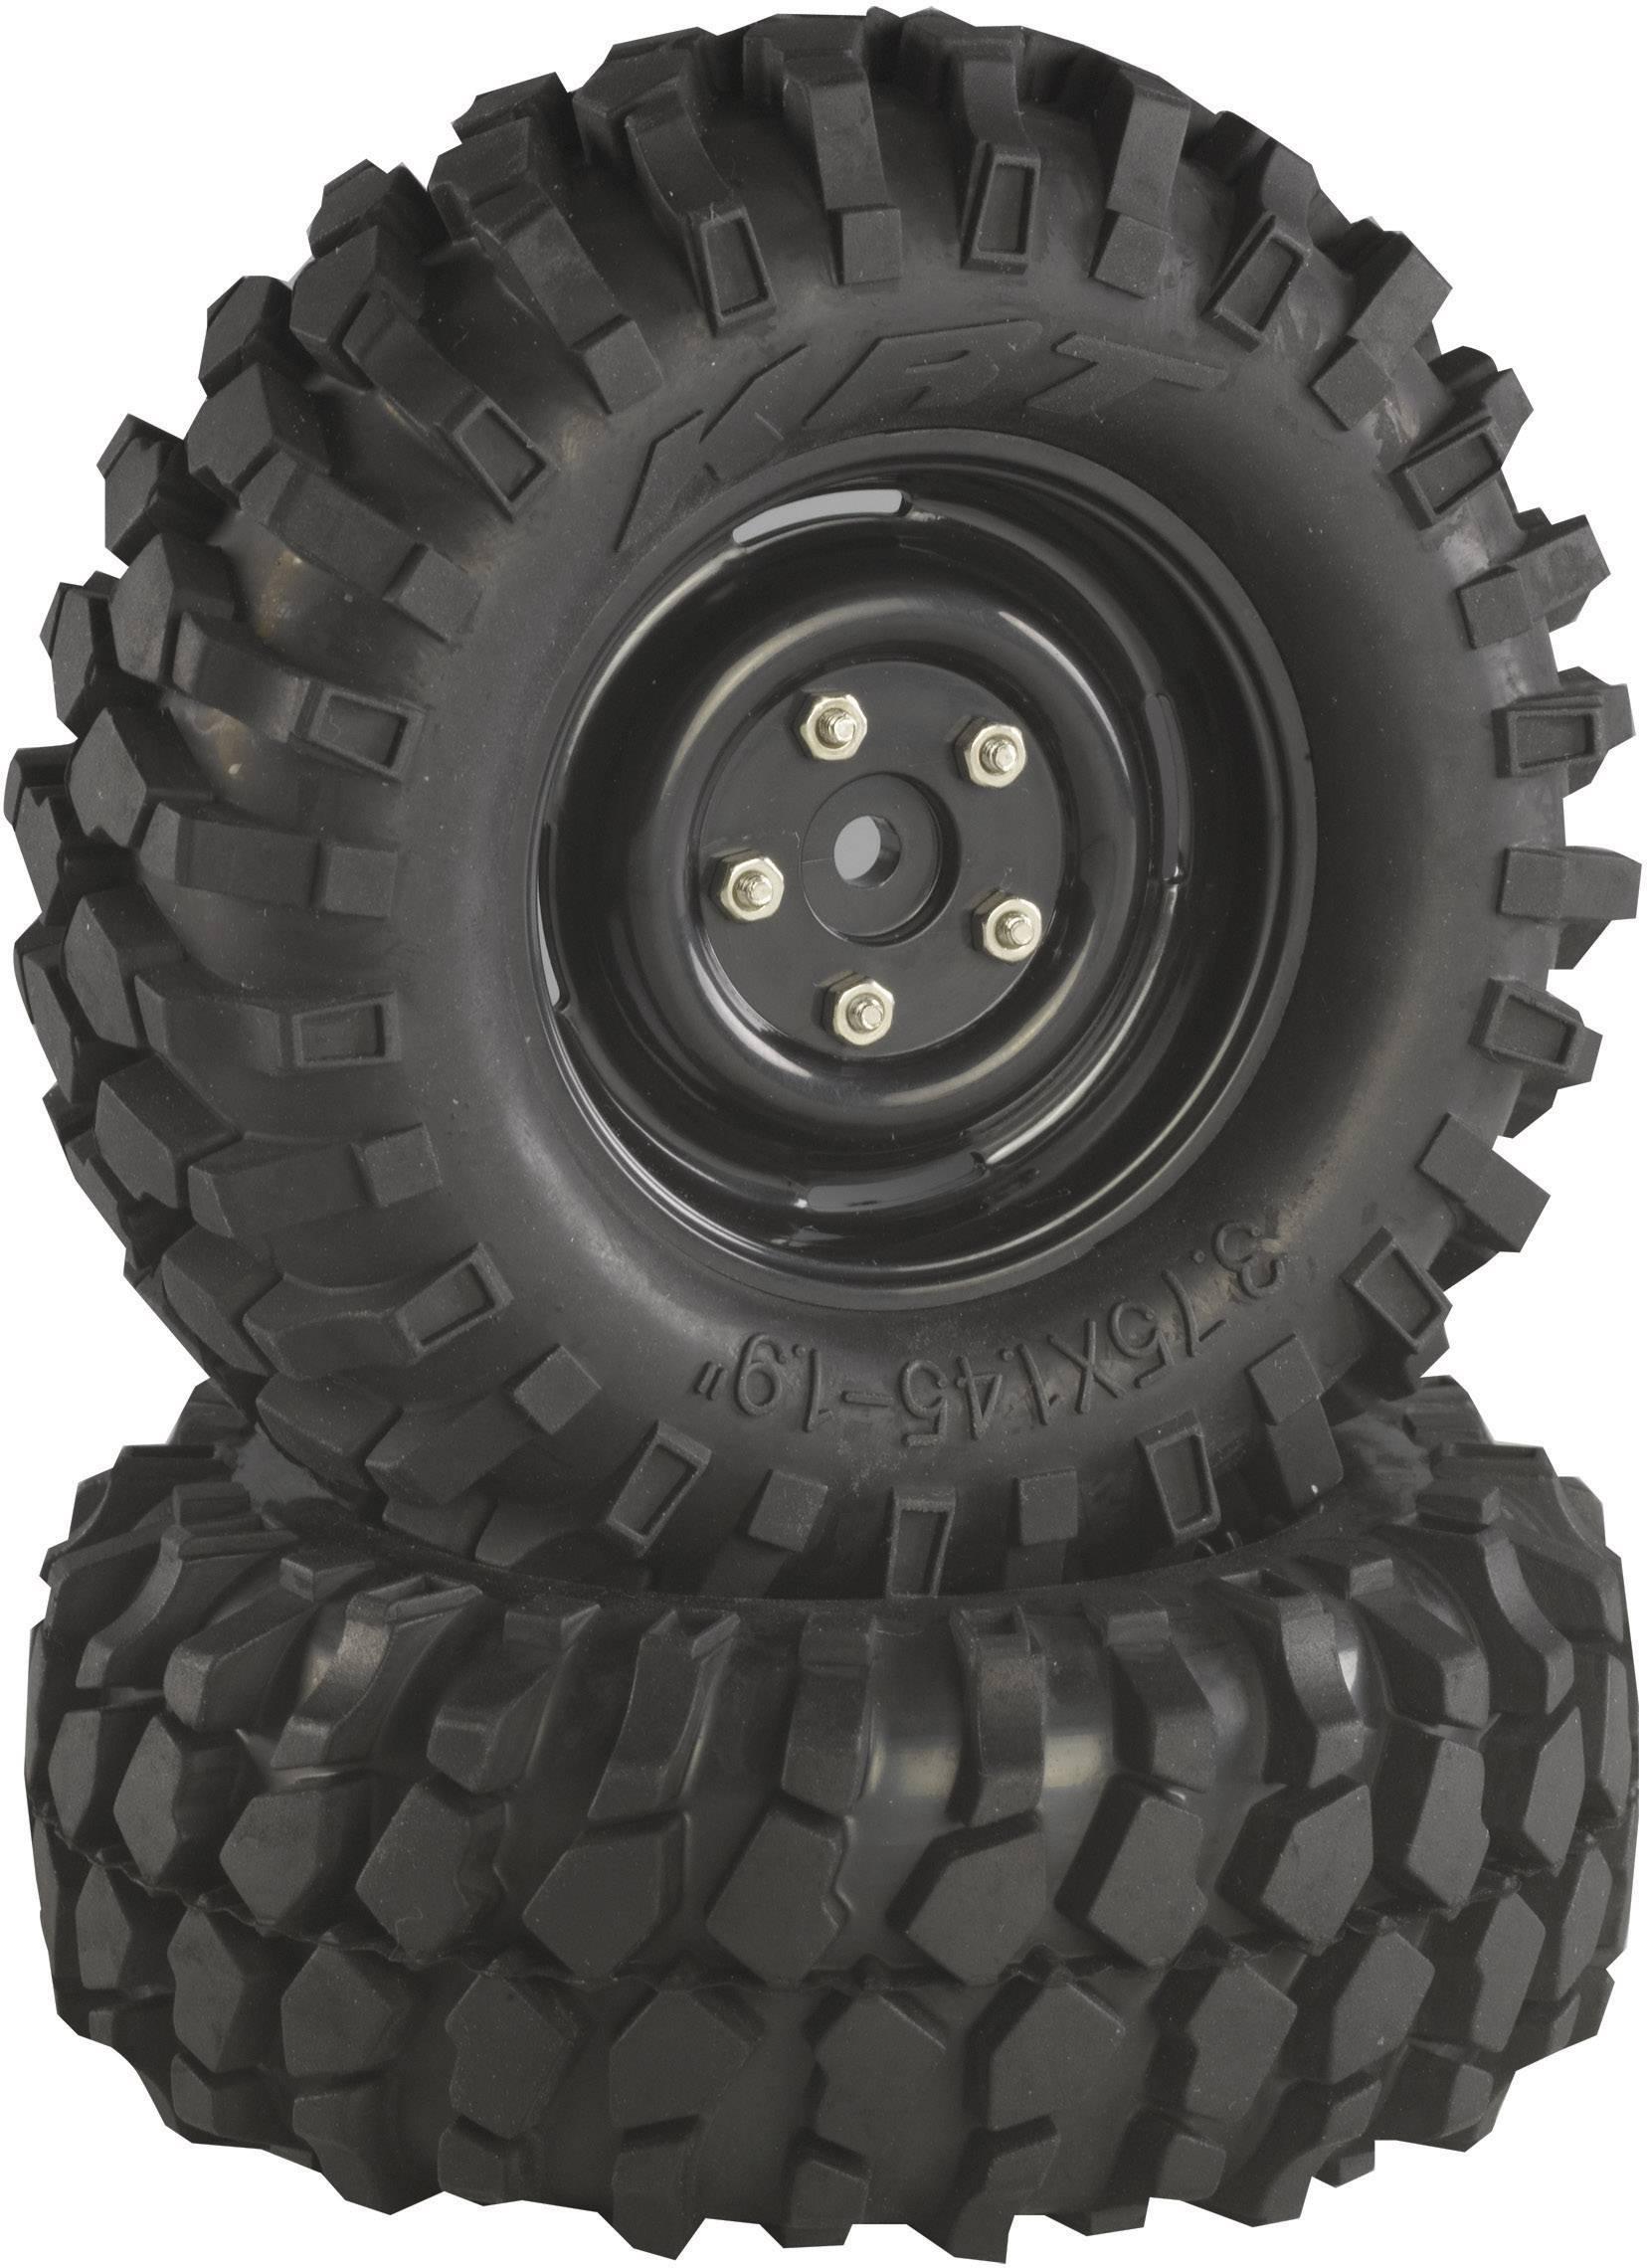 Kompletné kolesá Offroad V Block Absima 2500031 pre crawler, 96 mm, 1:10, 2 ks, čierna